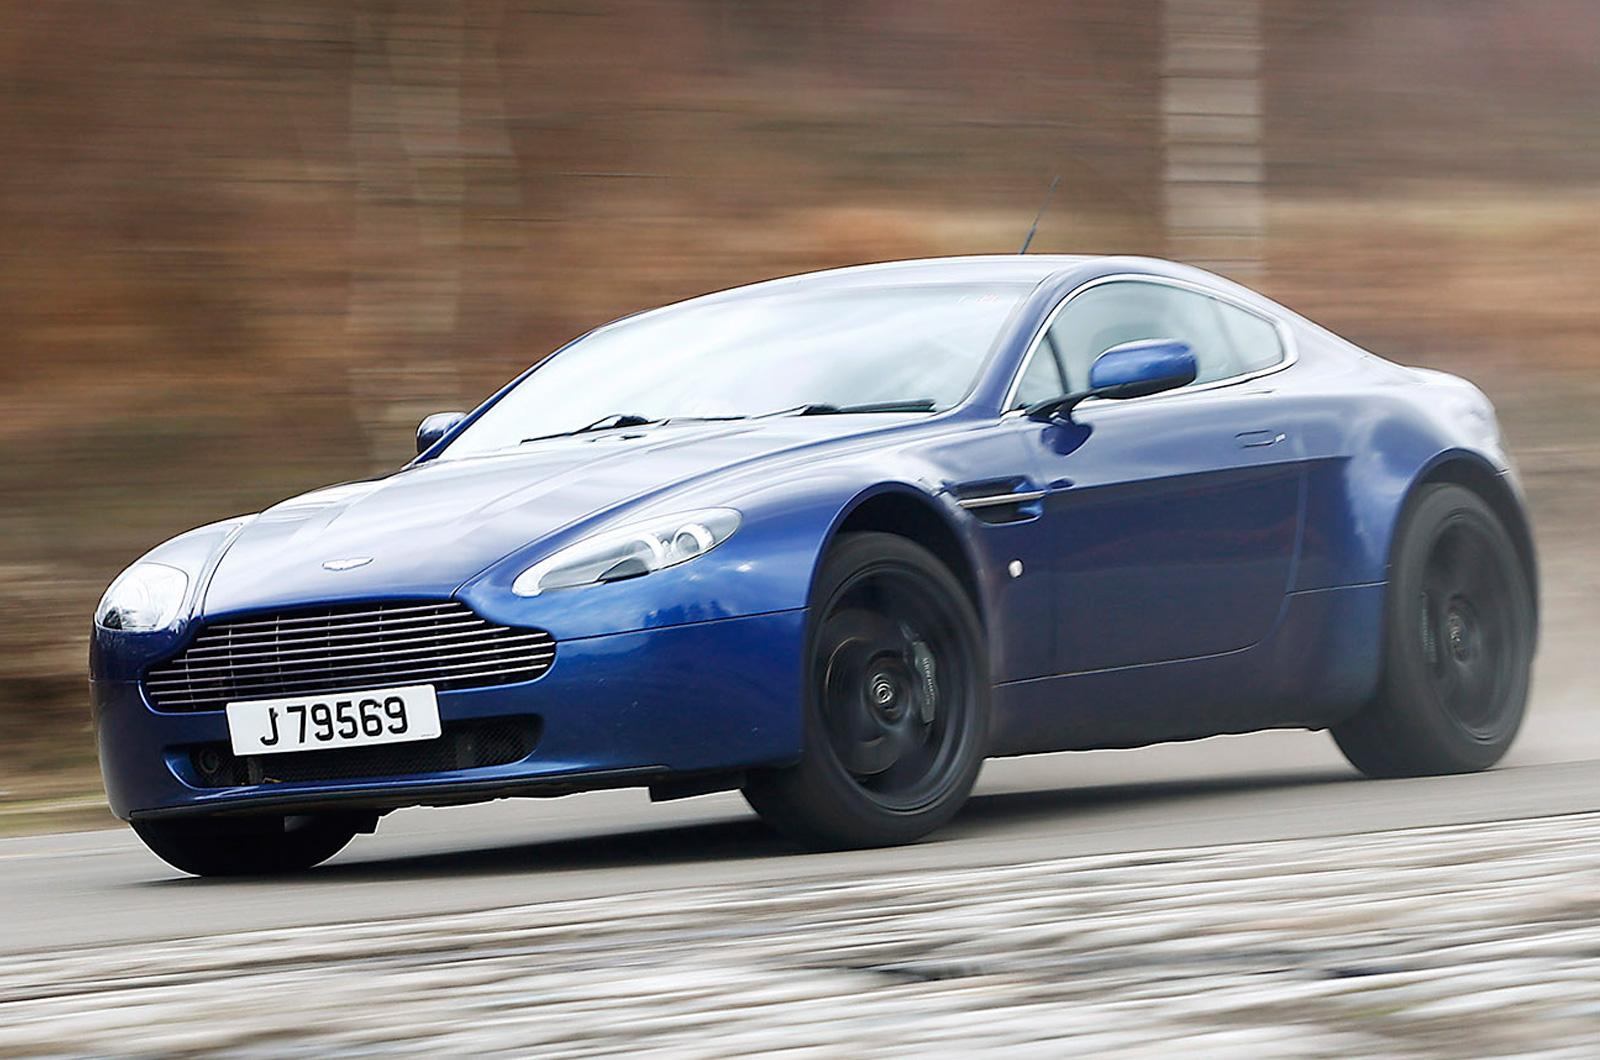 Gmr 600 Aston Martin V8 Vantage First Drive